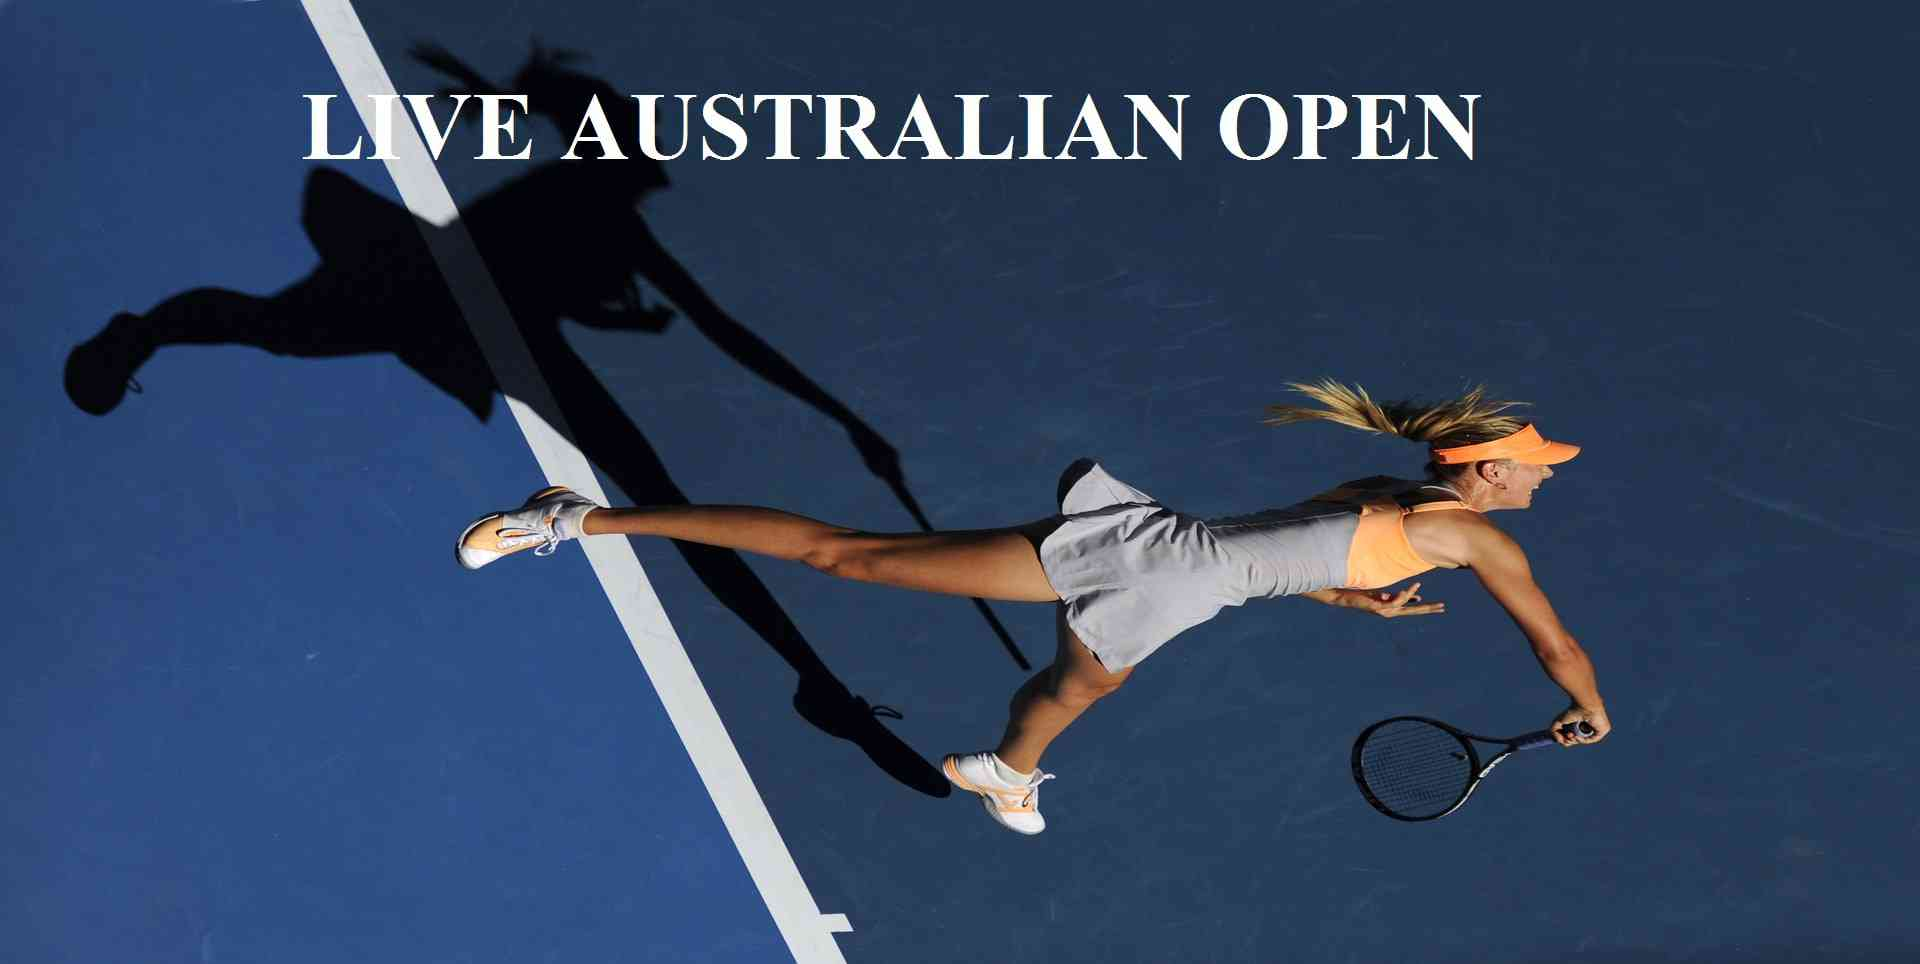 2018 Australian Open Second Round Live